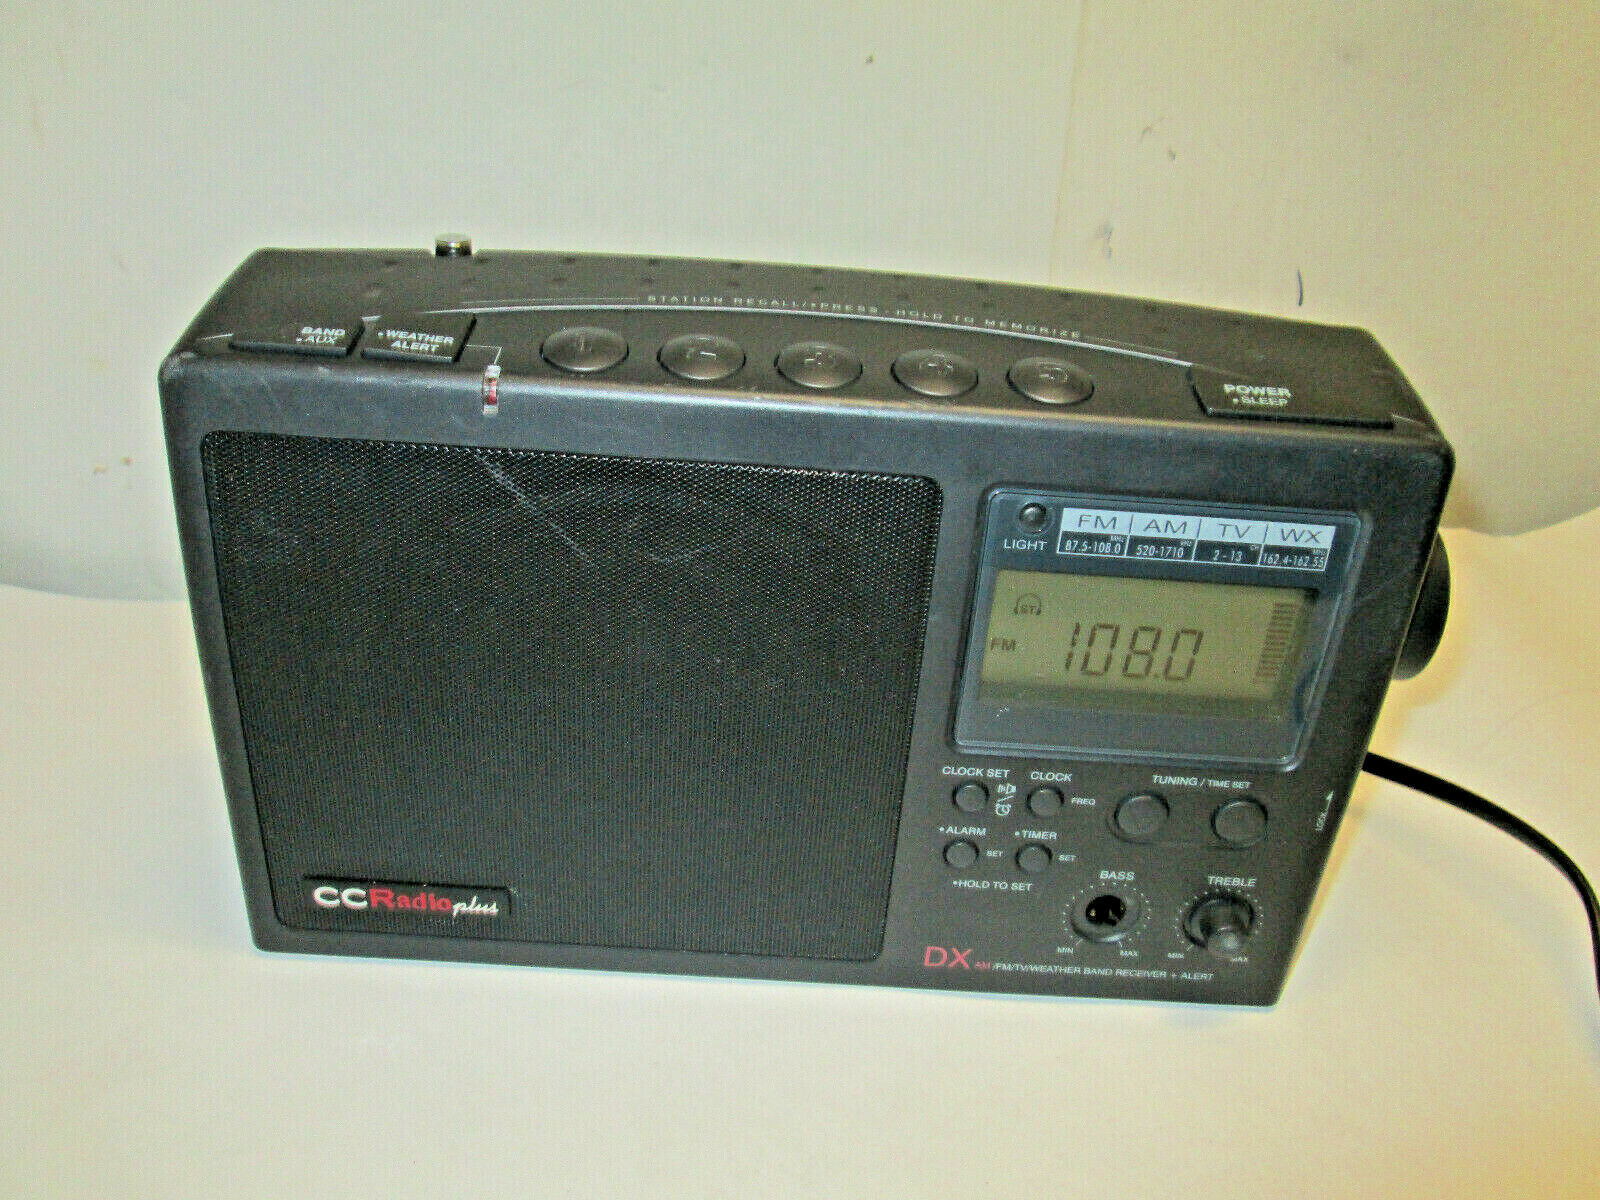 Cariole Portable Multi Band Radio Am FM TV CB Receiver Model 28160 for sale  online